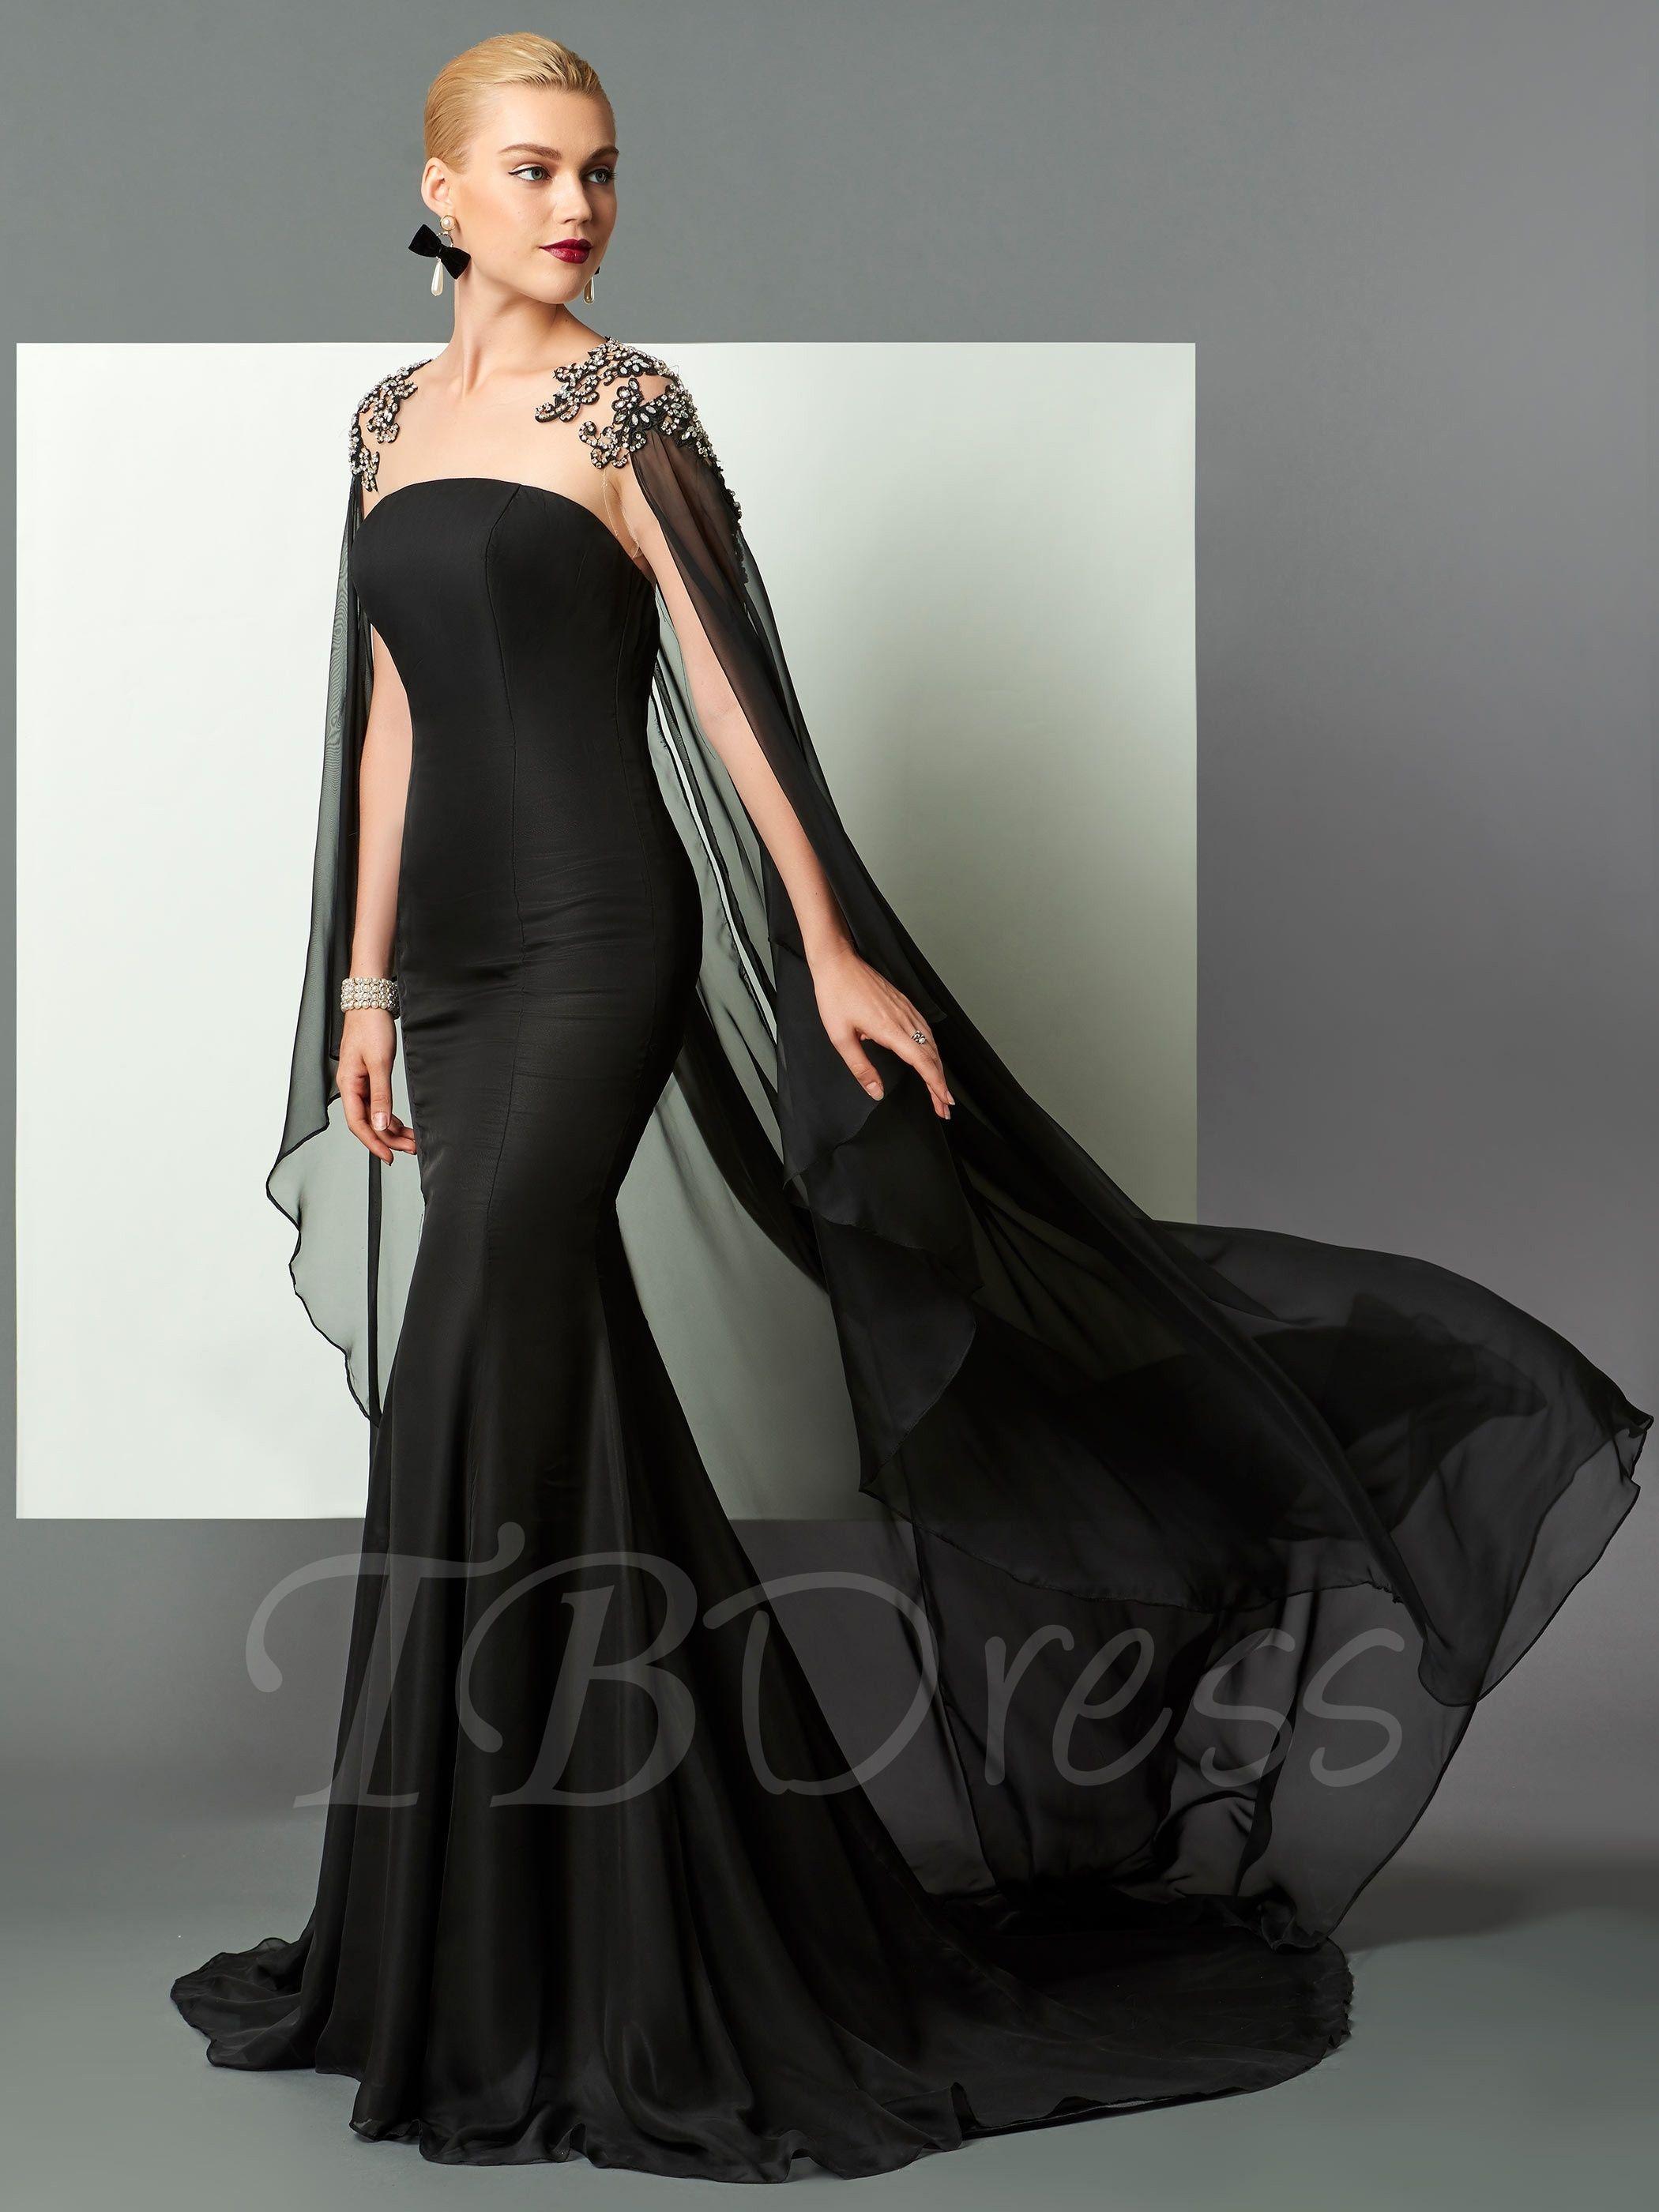 Scoop Mermaid Beading Lace Watteau Train Evening Dress Black Lace Evening Dress Train Evening Dress Evening Dress Patterns